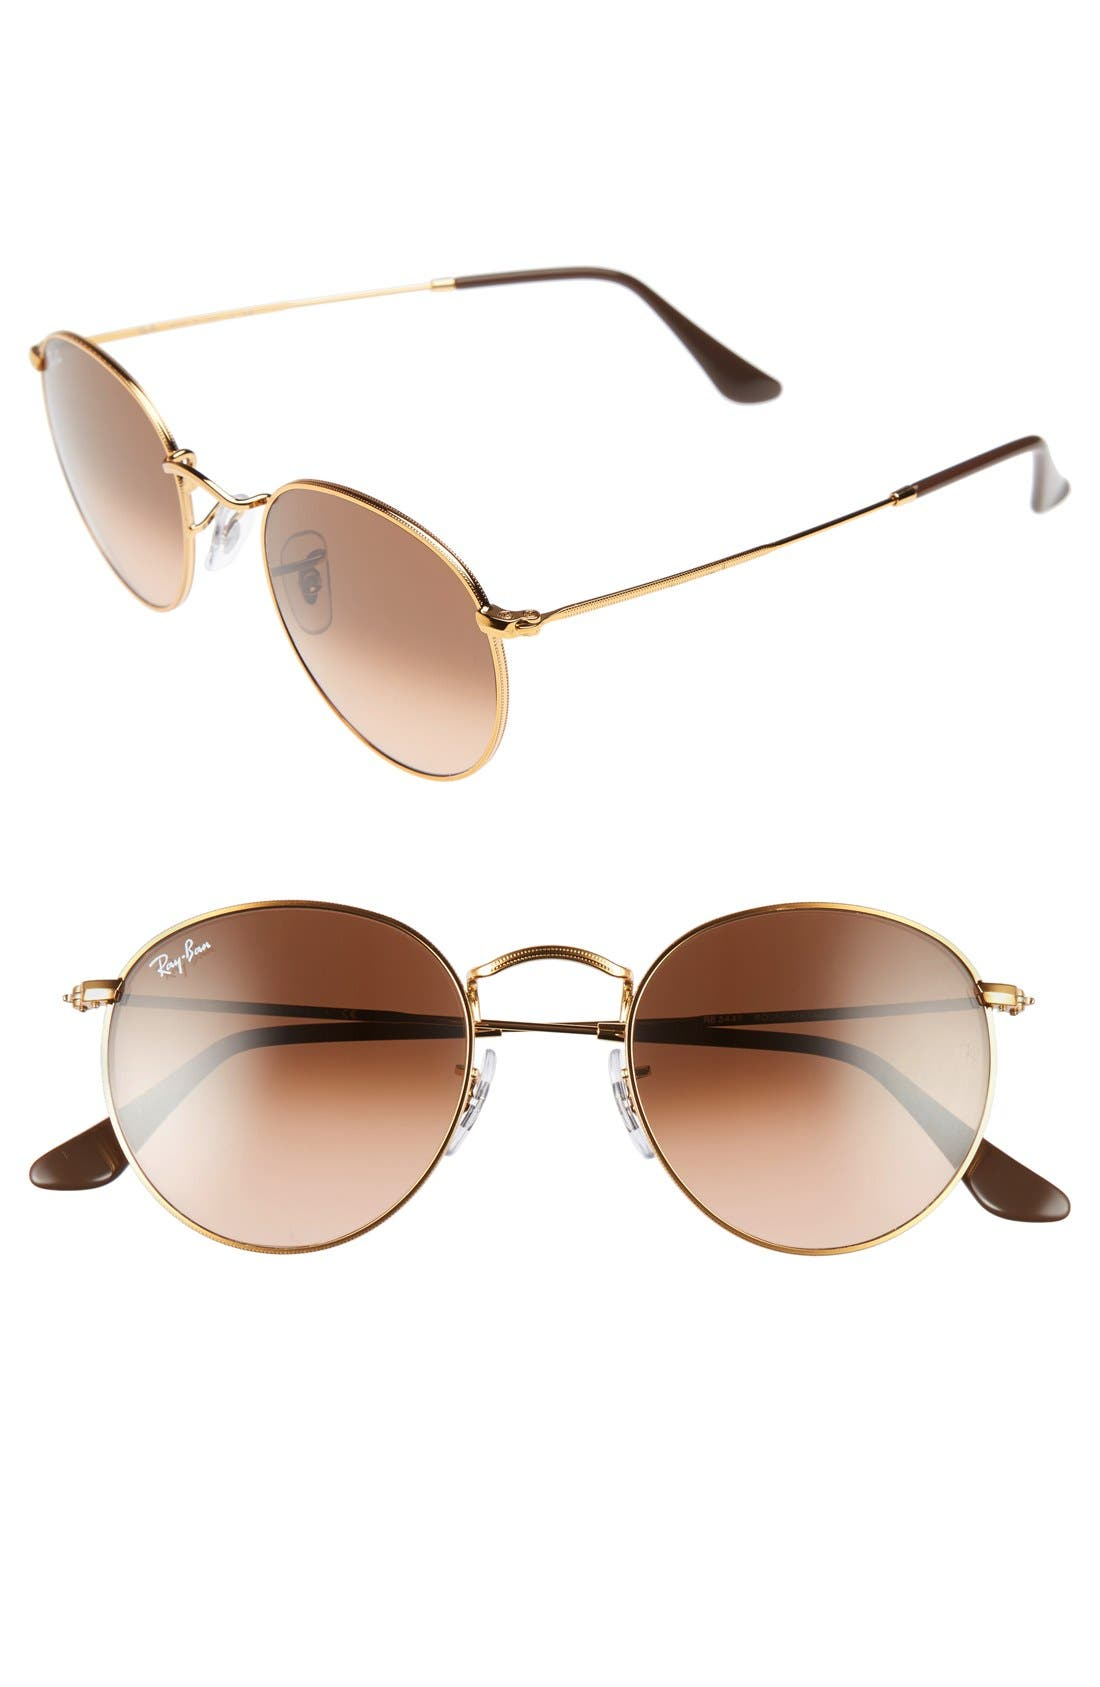 Ray-Ban Icons 50mm Retro Sunglasses